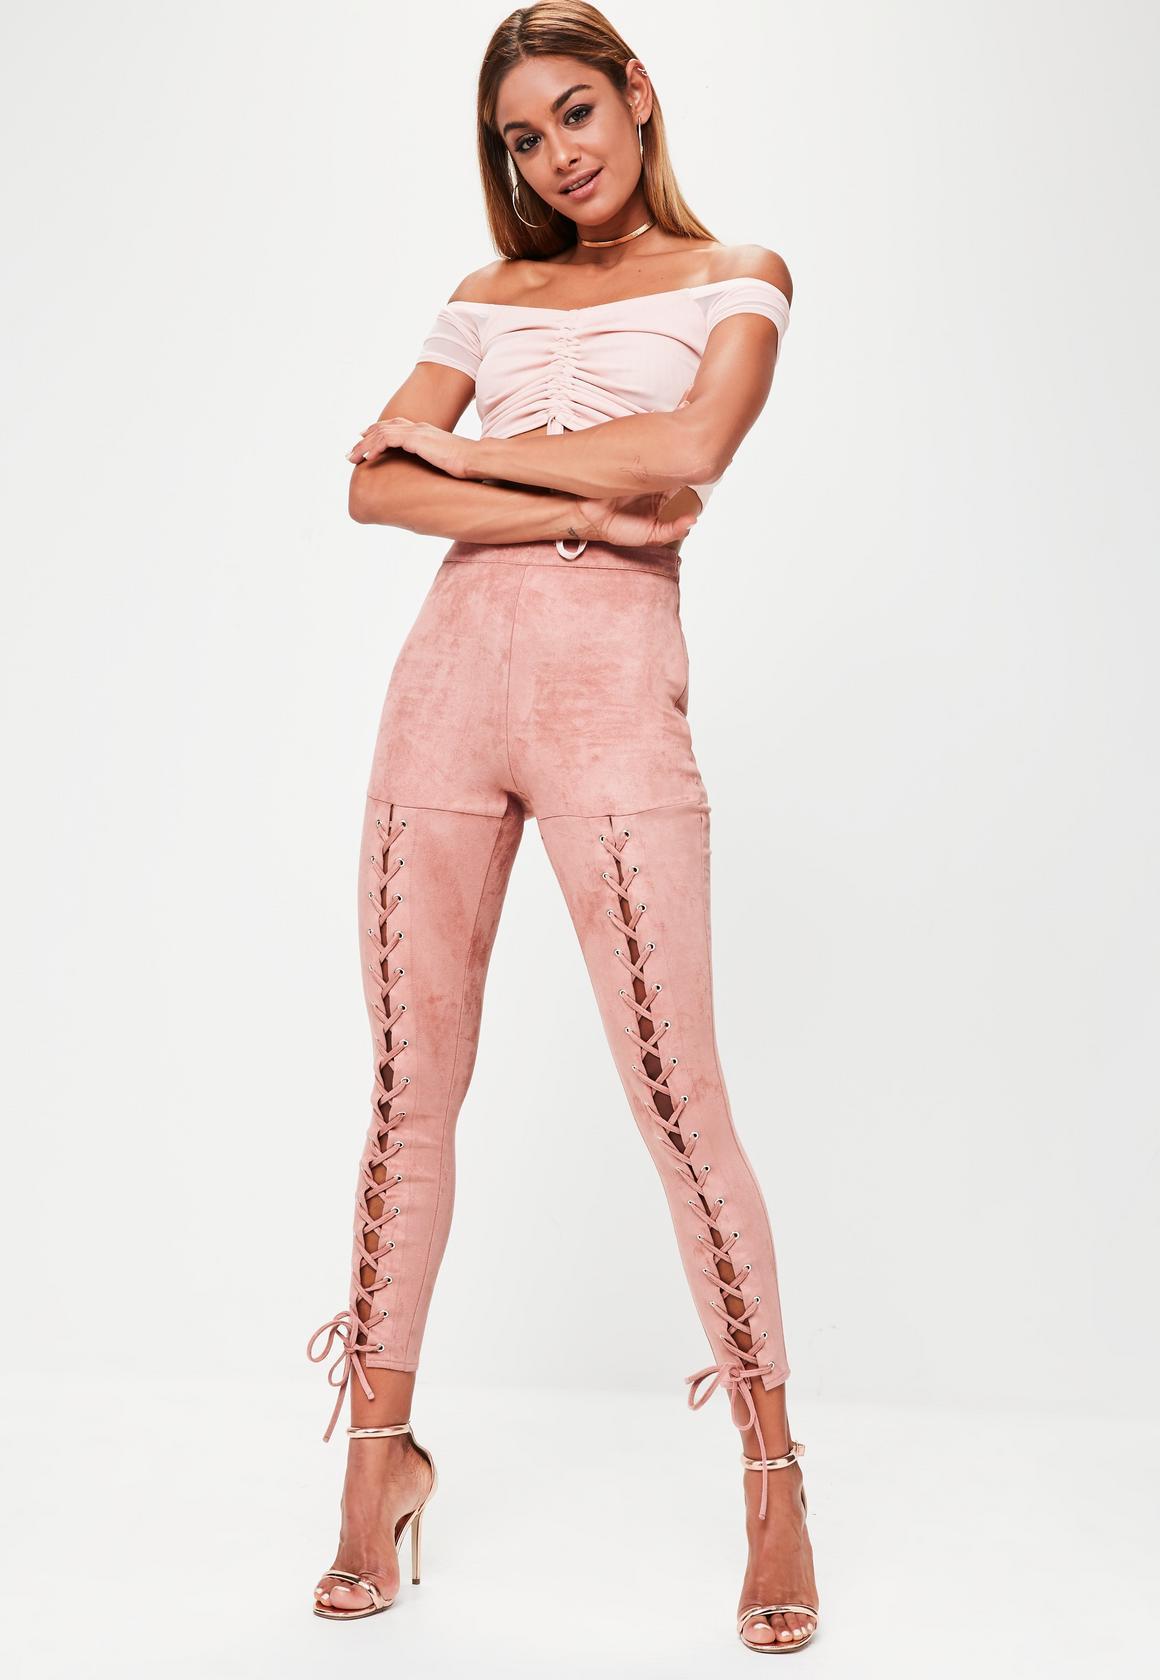 pink-light-leggings-white-crop-top-offshoulder-hoops-spring-summer-hairr-dinner.jpg